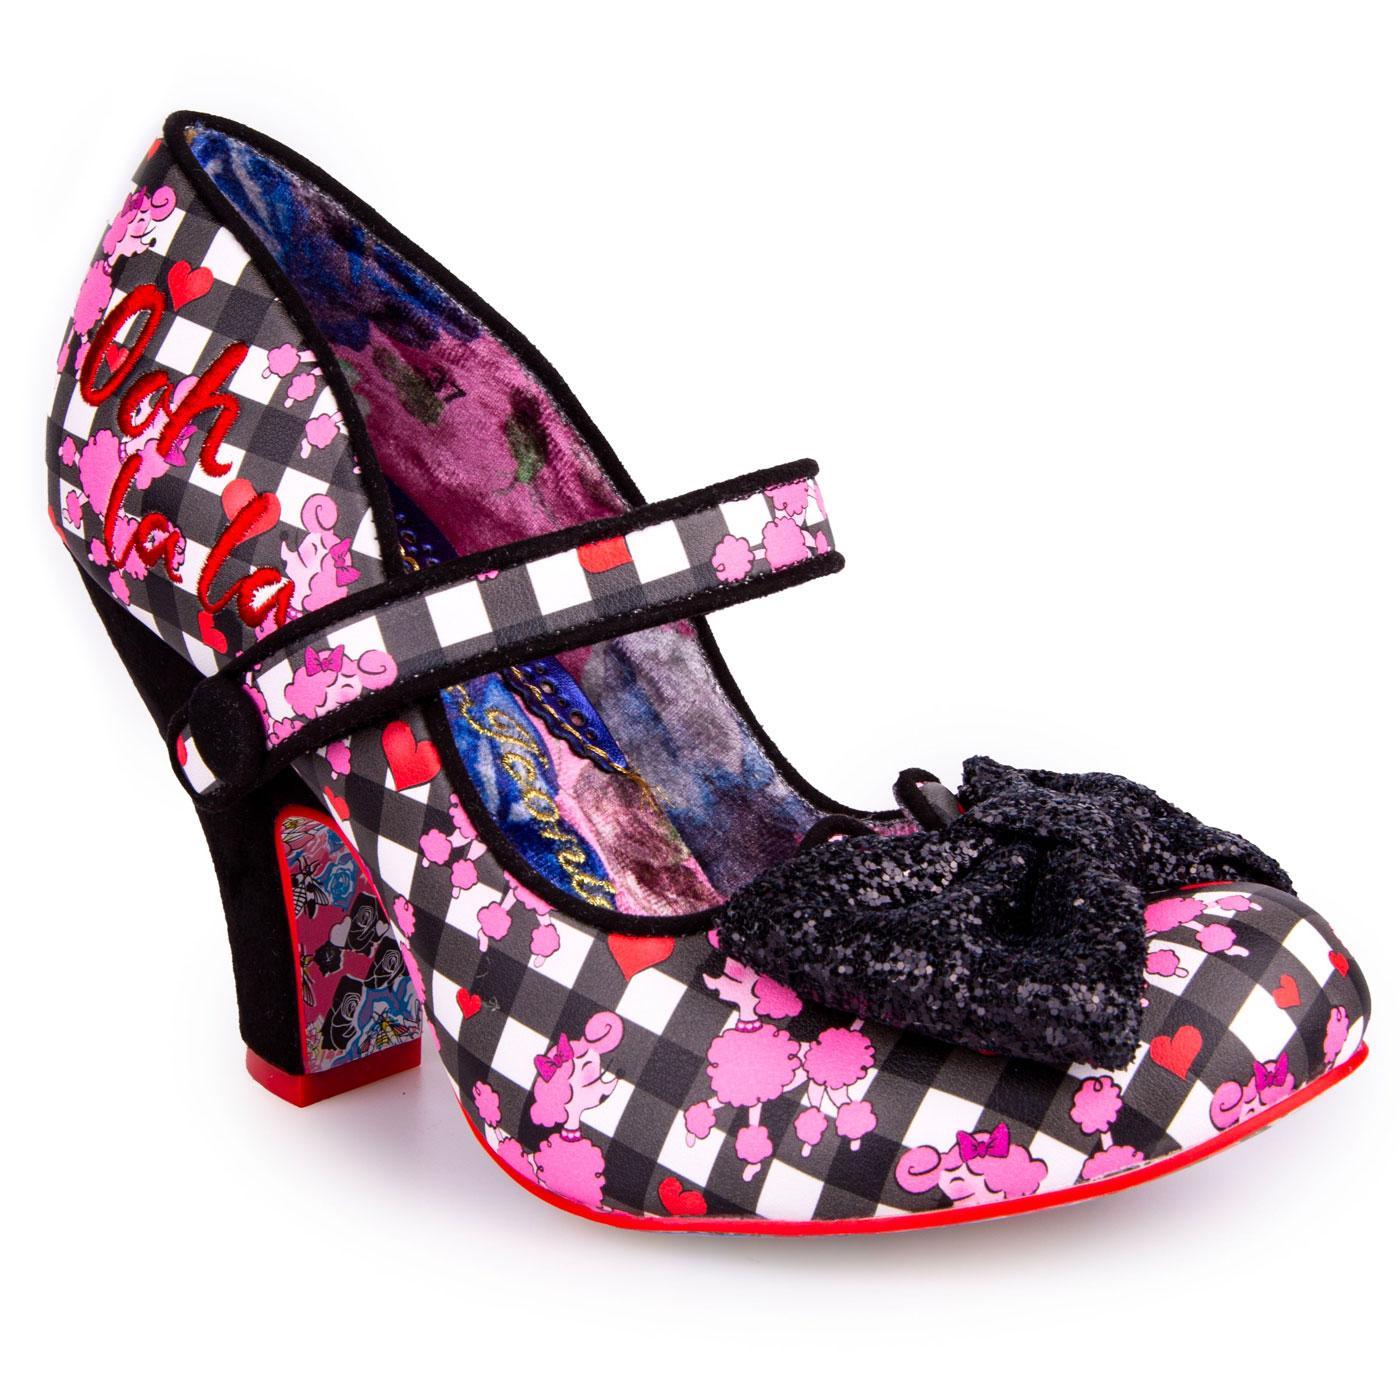 Fancy That IRREGULAR CHOICE Gingham Poodle Heels B